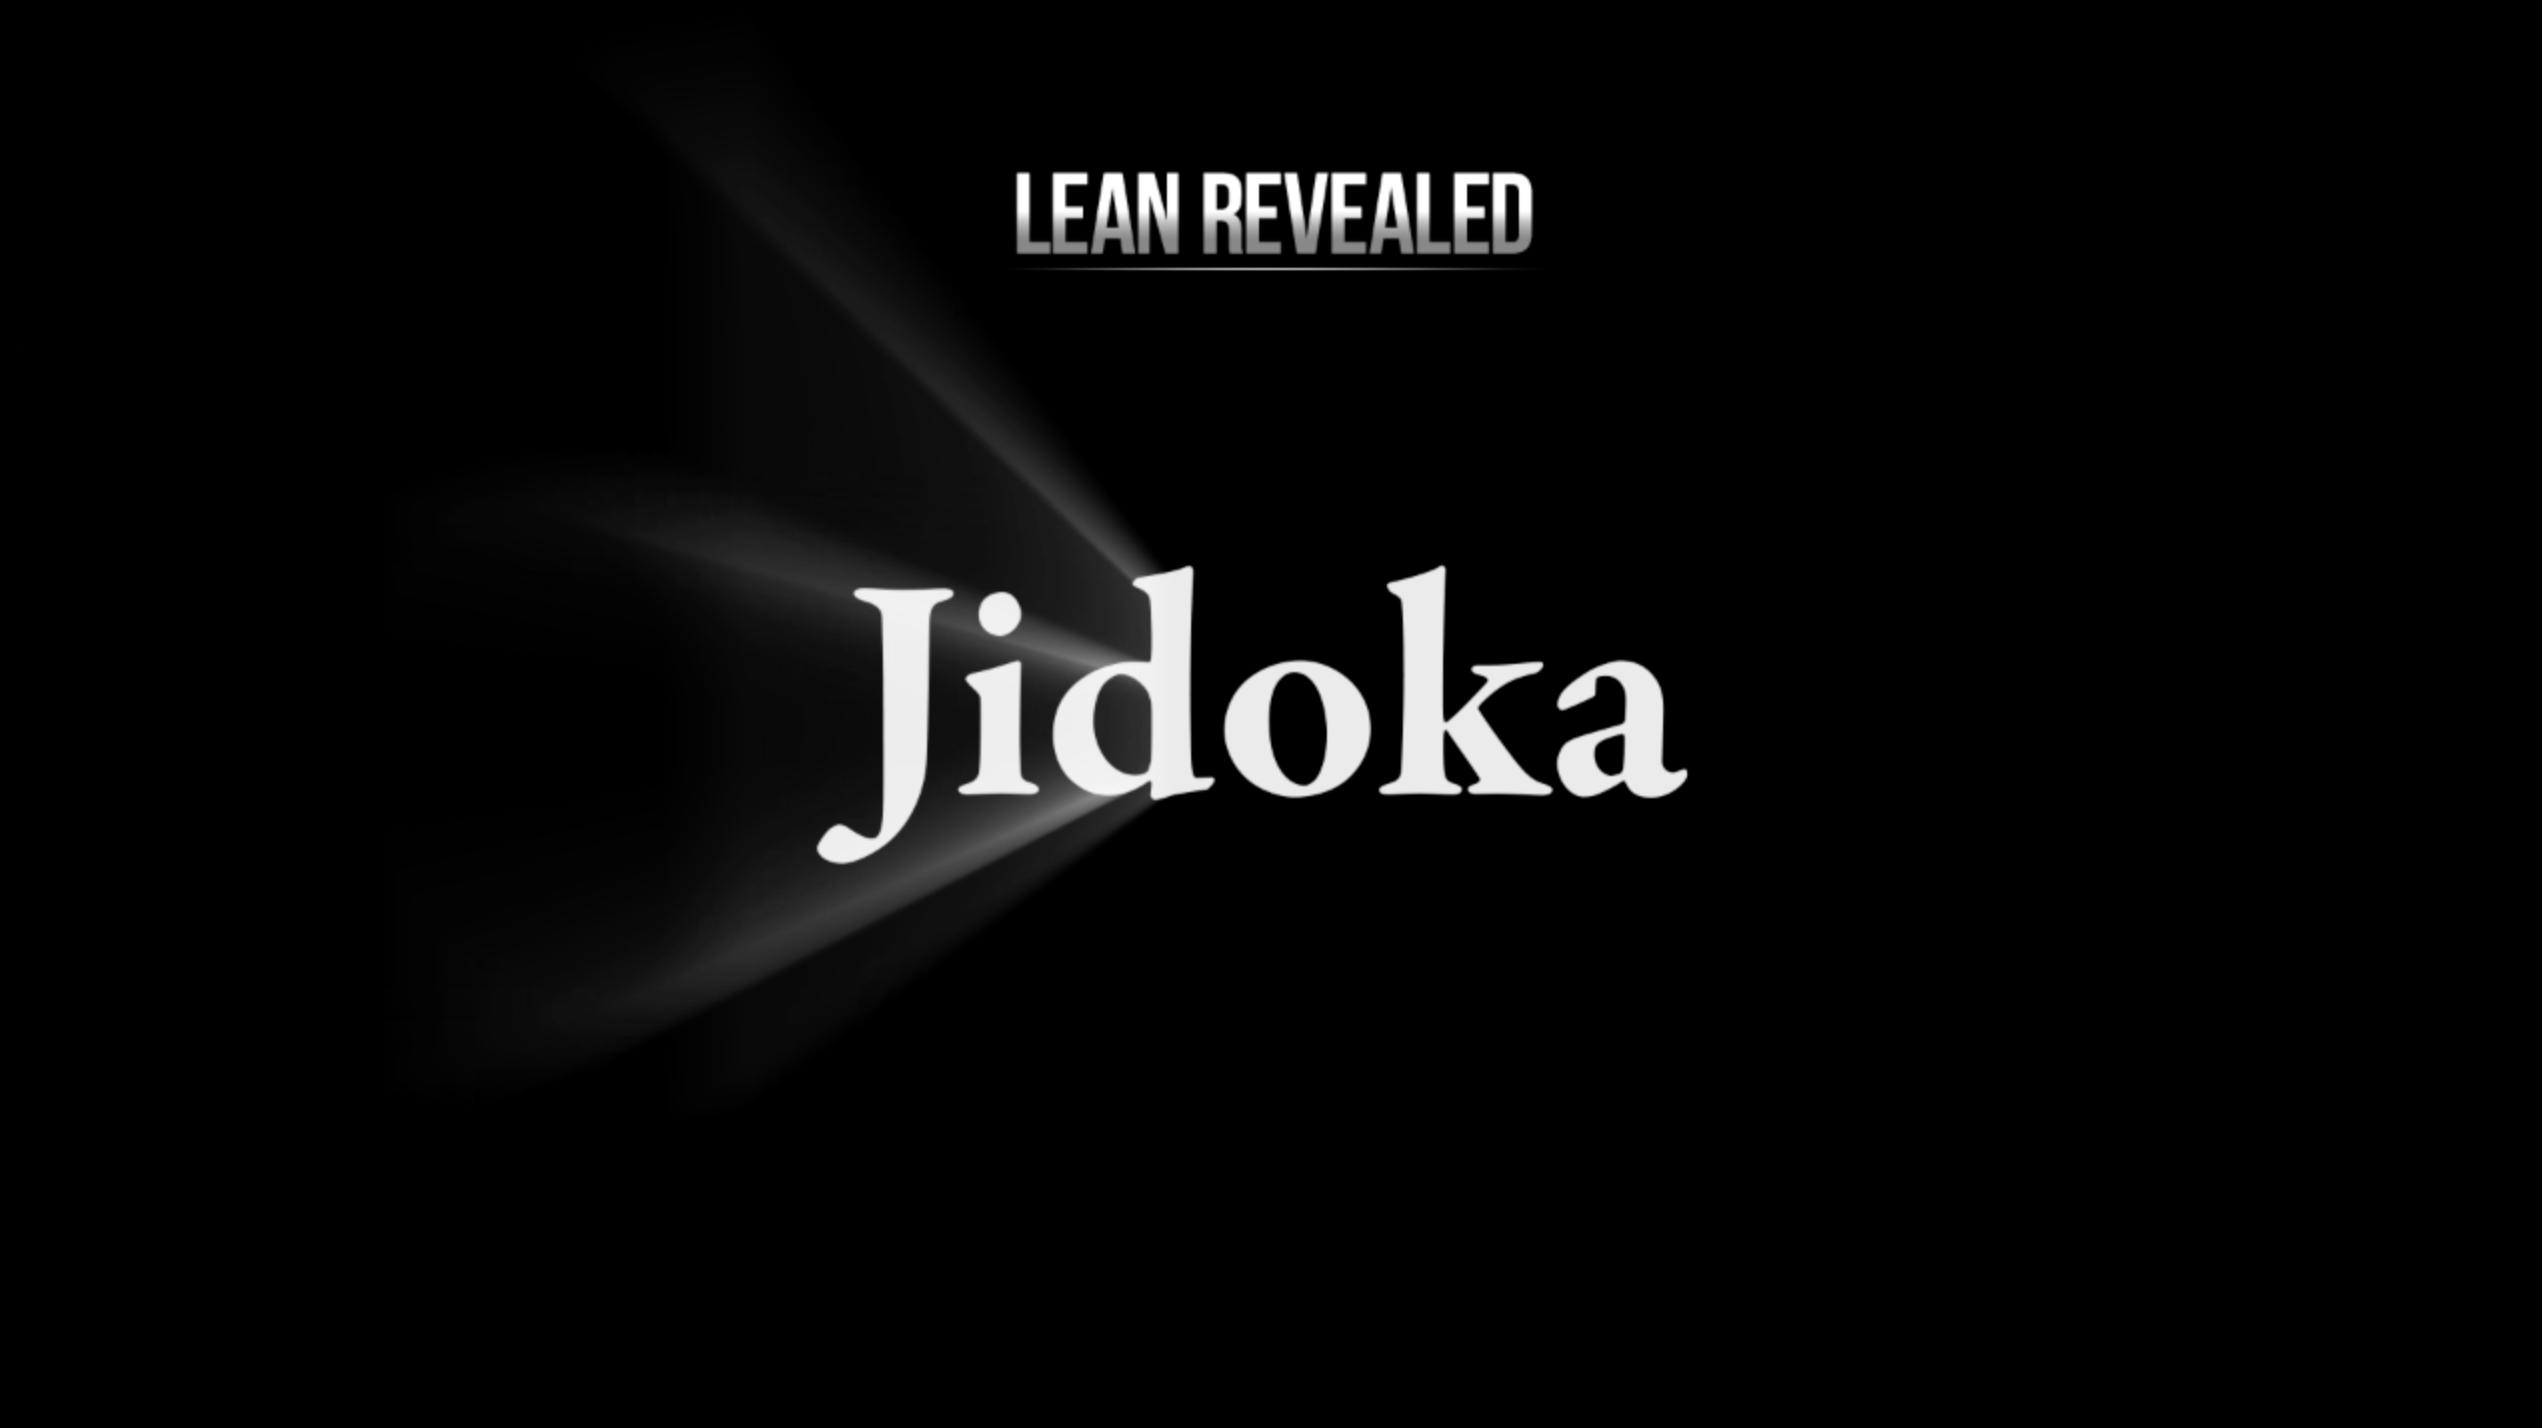 screen-shot2-lean-revealed-dvd.png